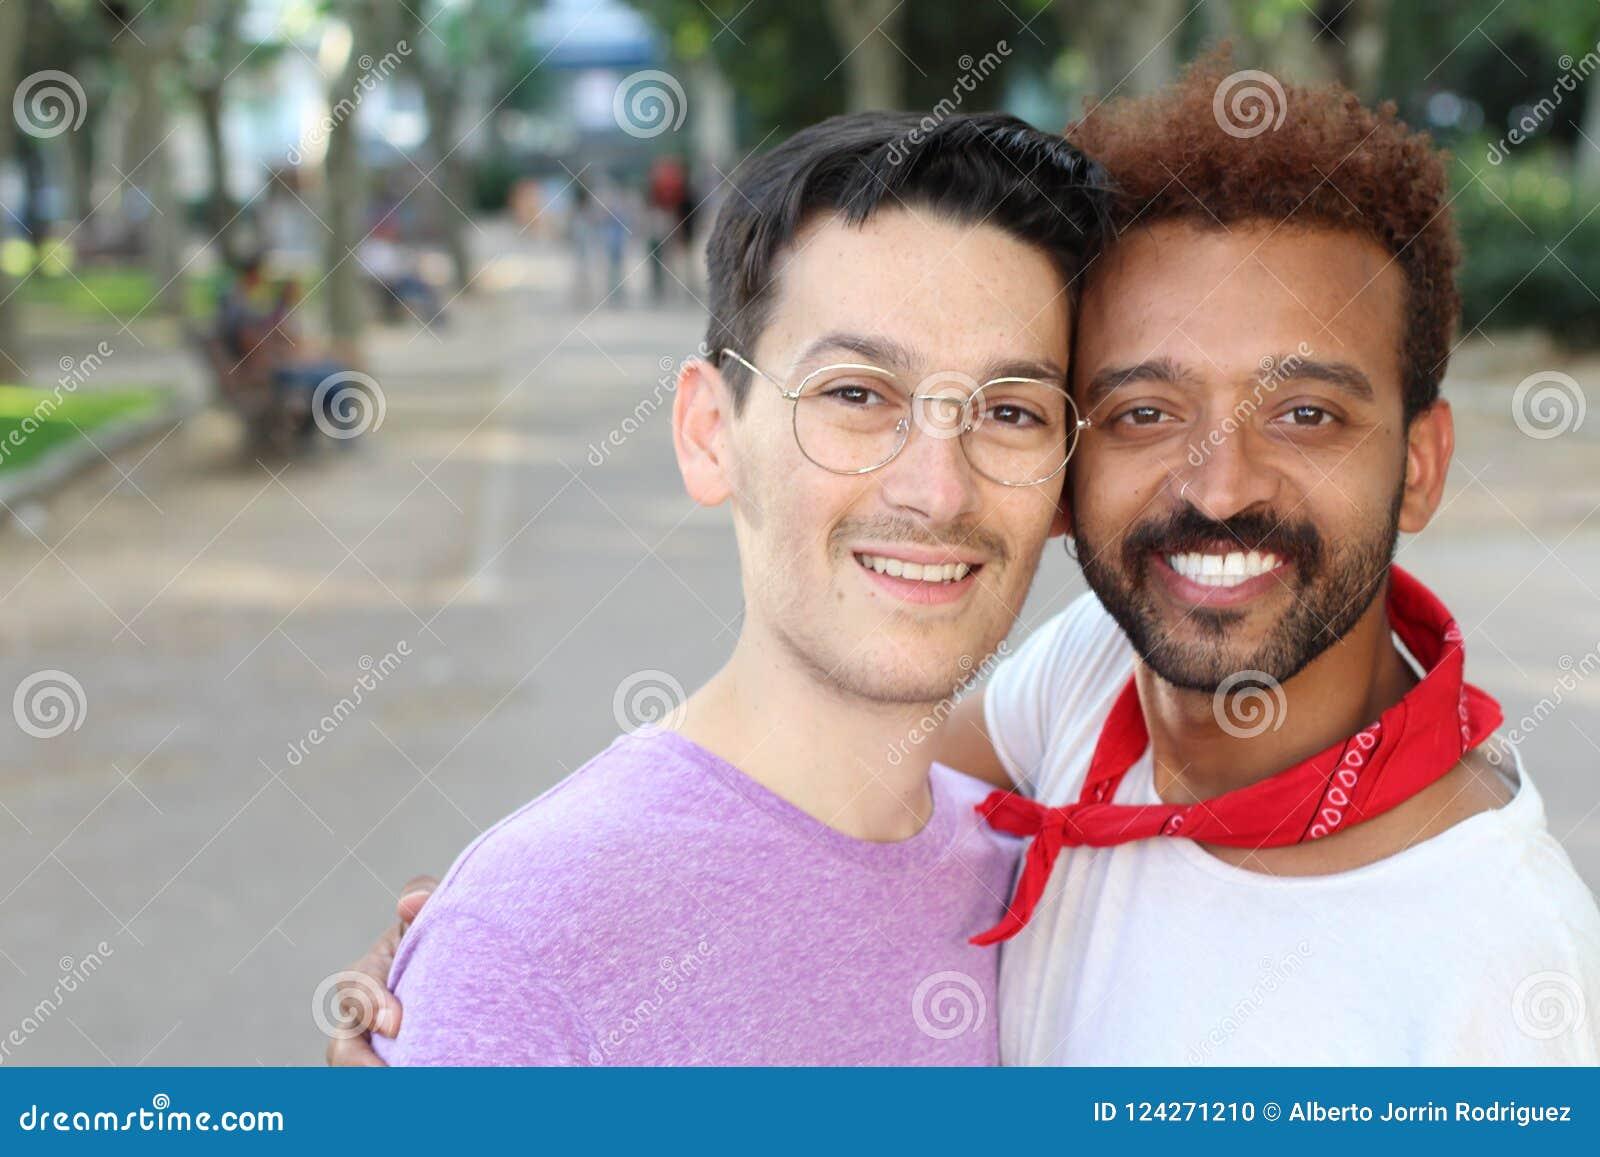 confirm. gay boy twink slut slave punnished dildo more than word! seems